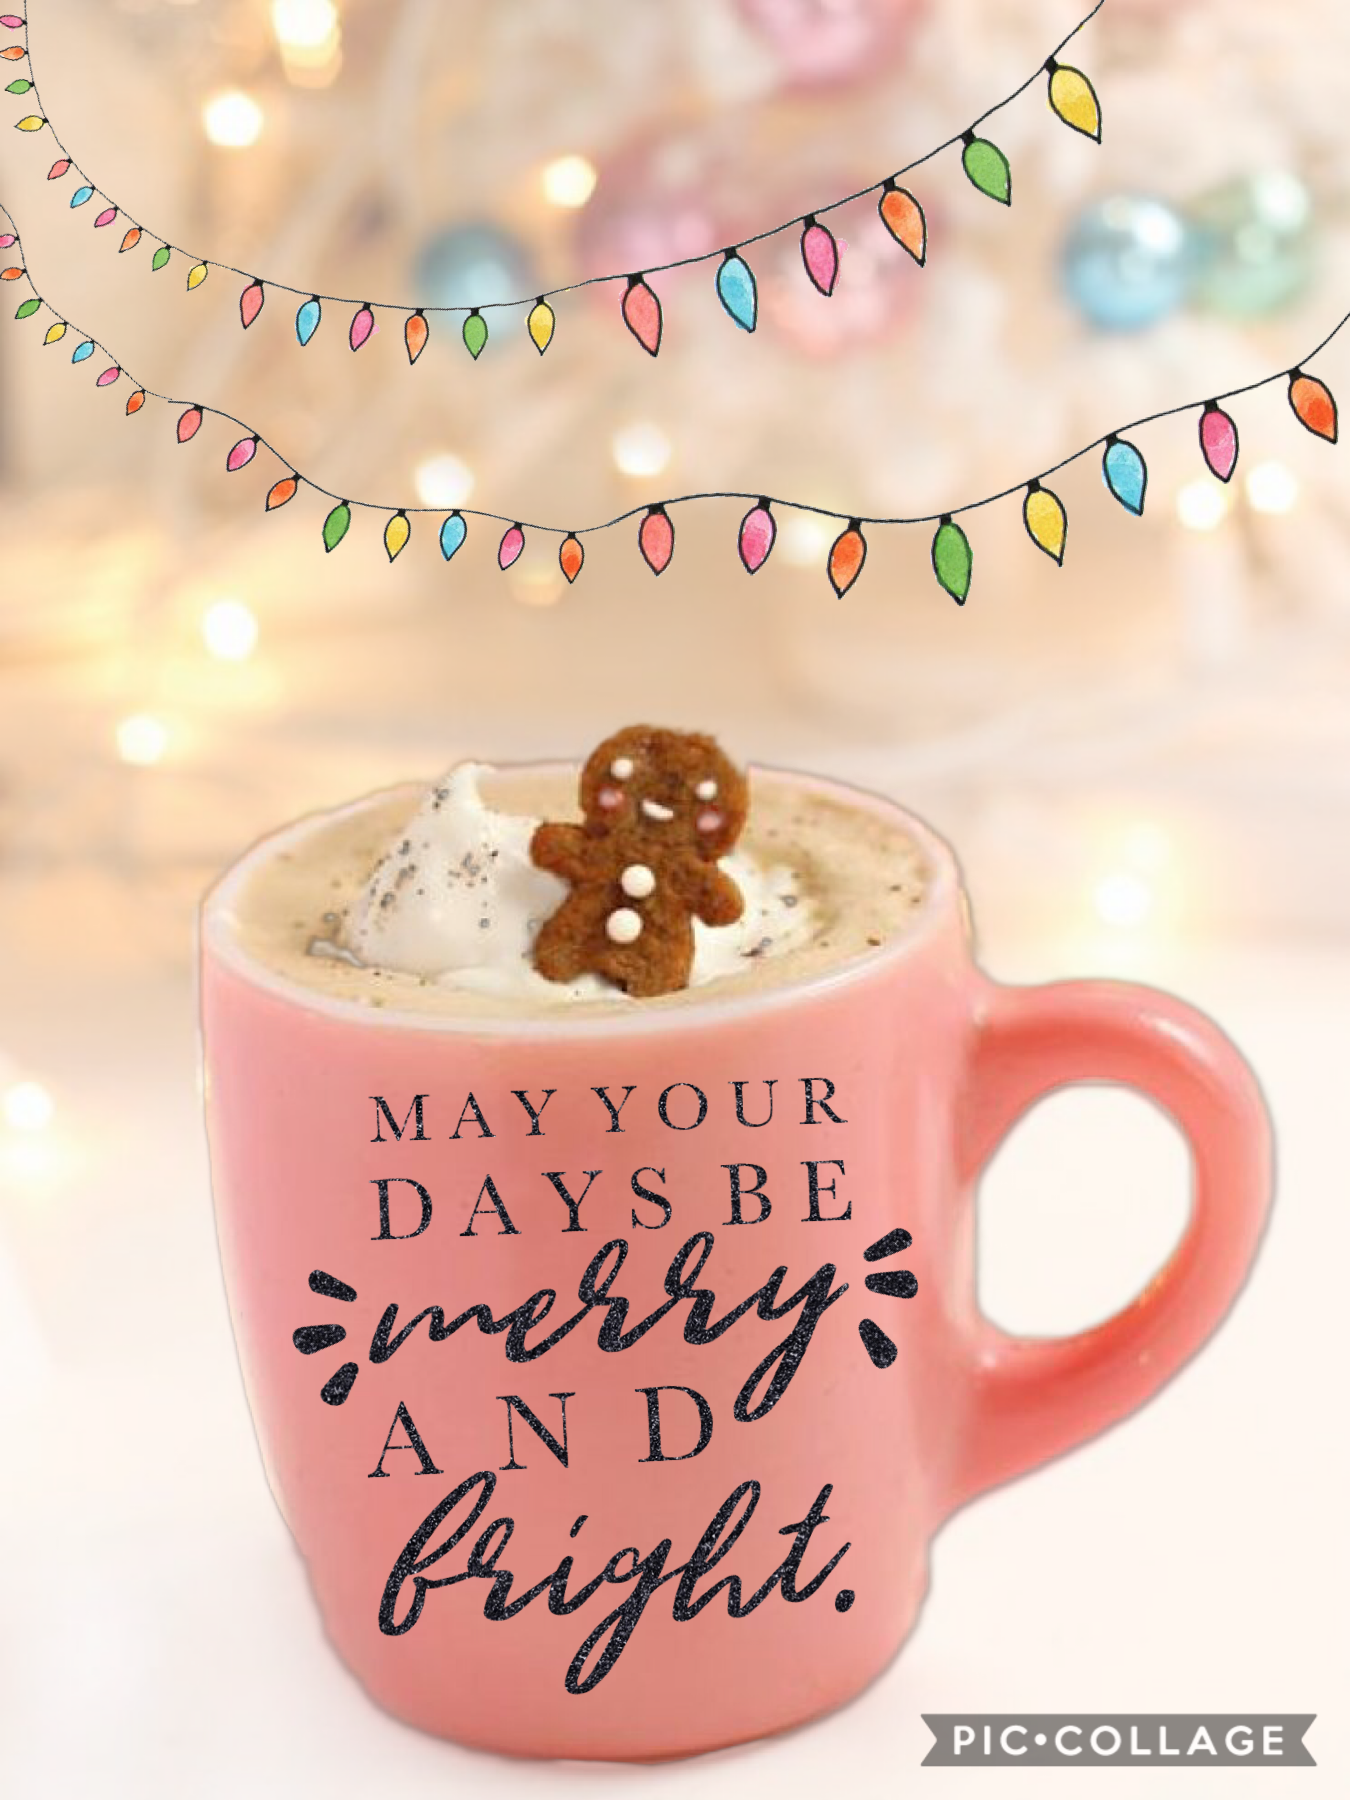 Hope y'all are having a wonderful holiday season!!! 💕 xoxo Pie